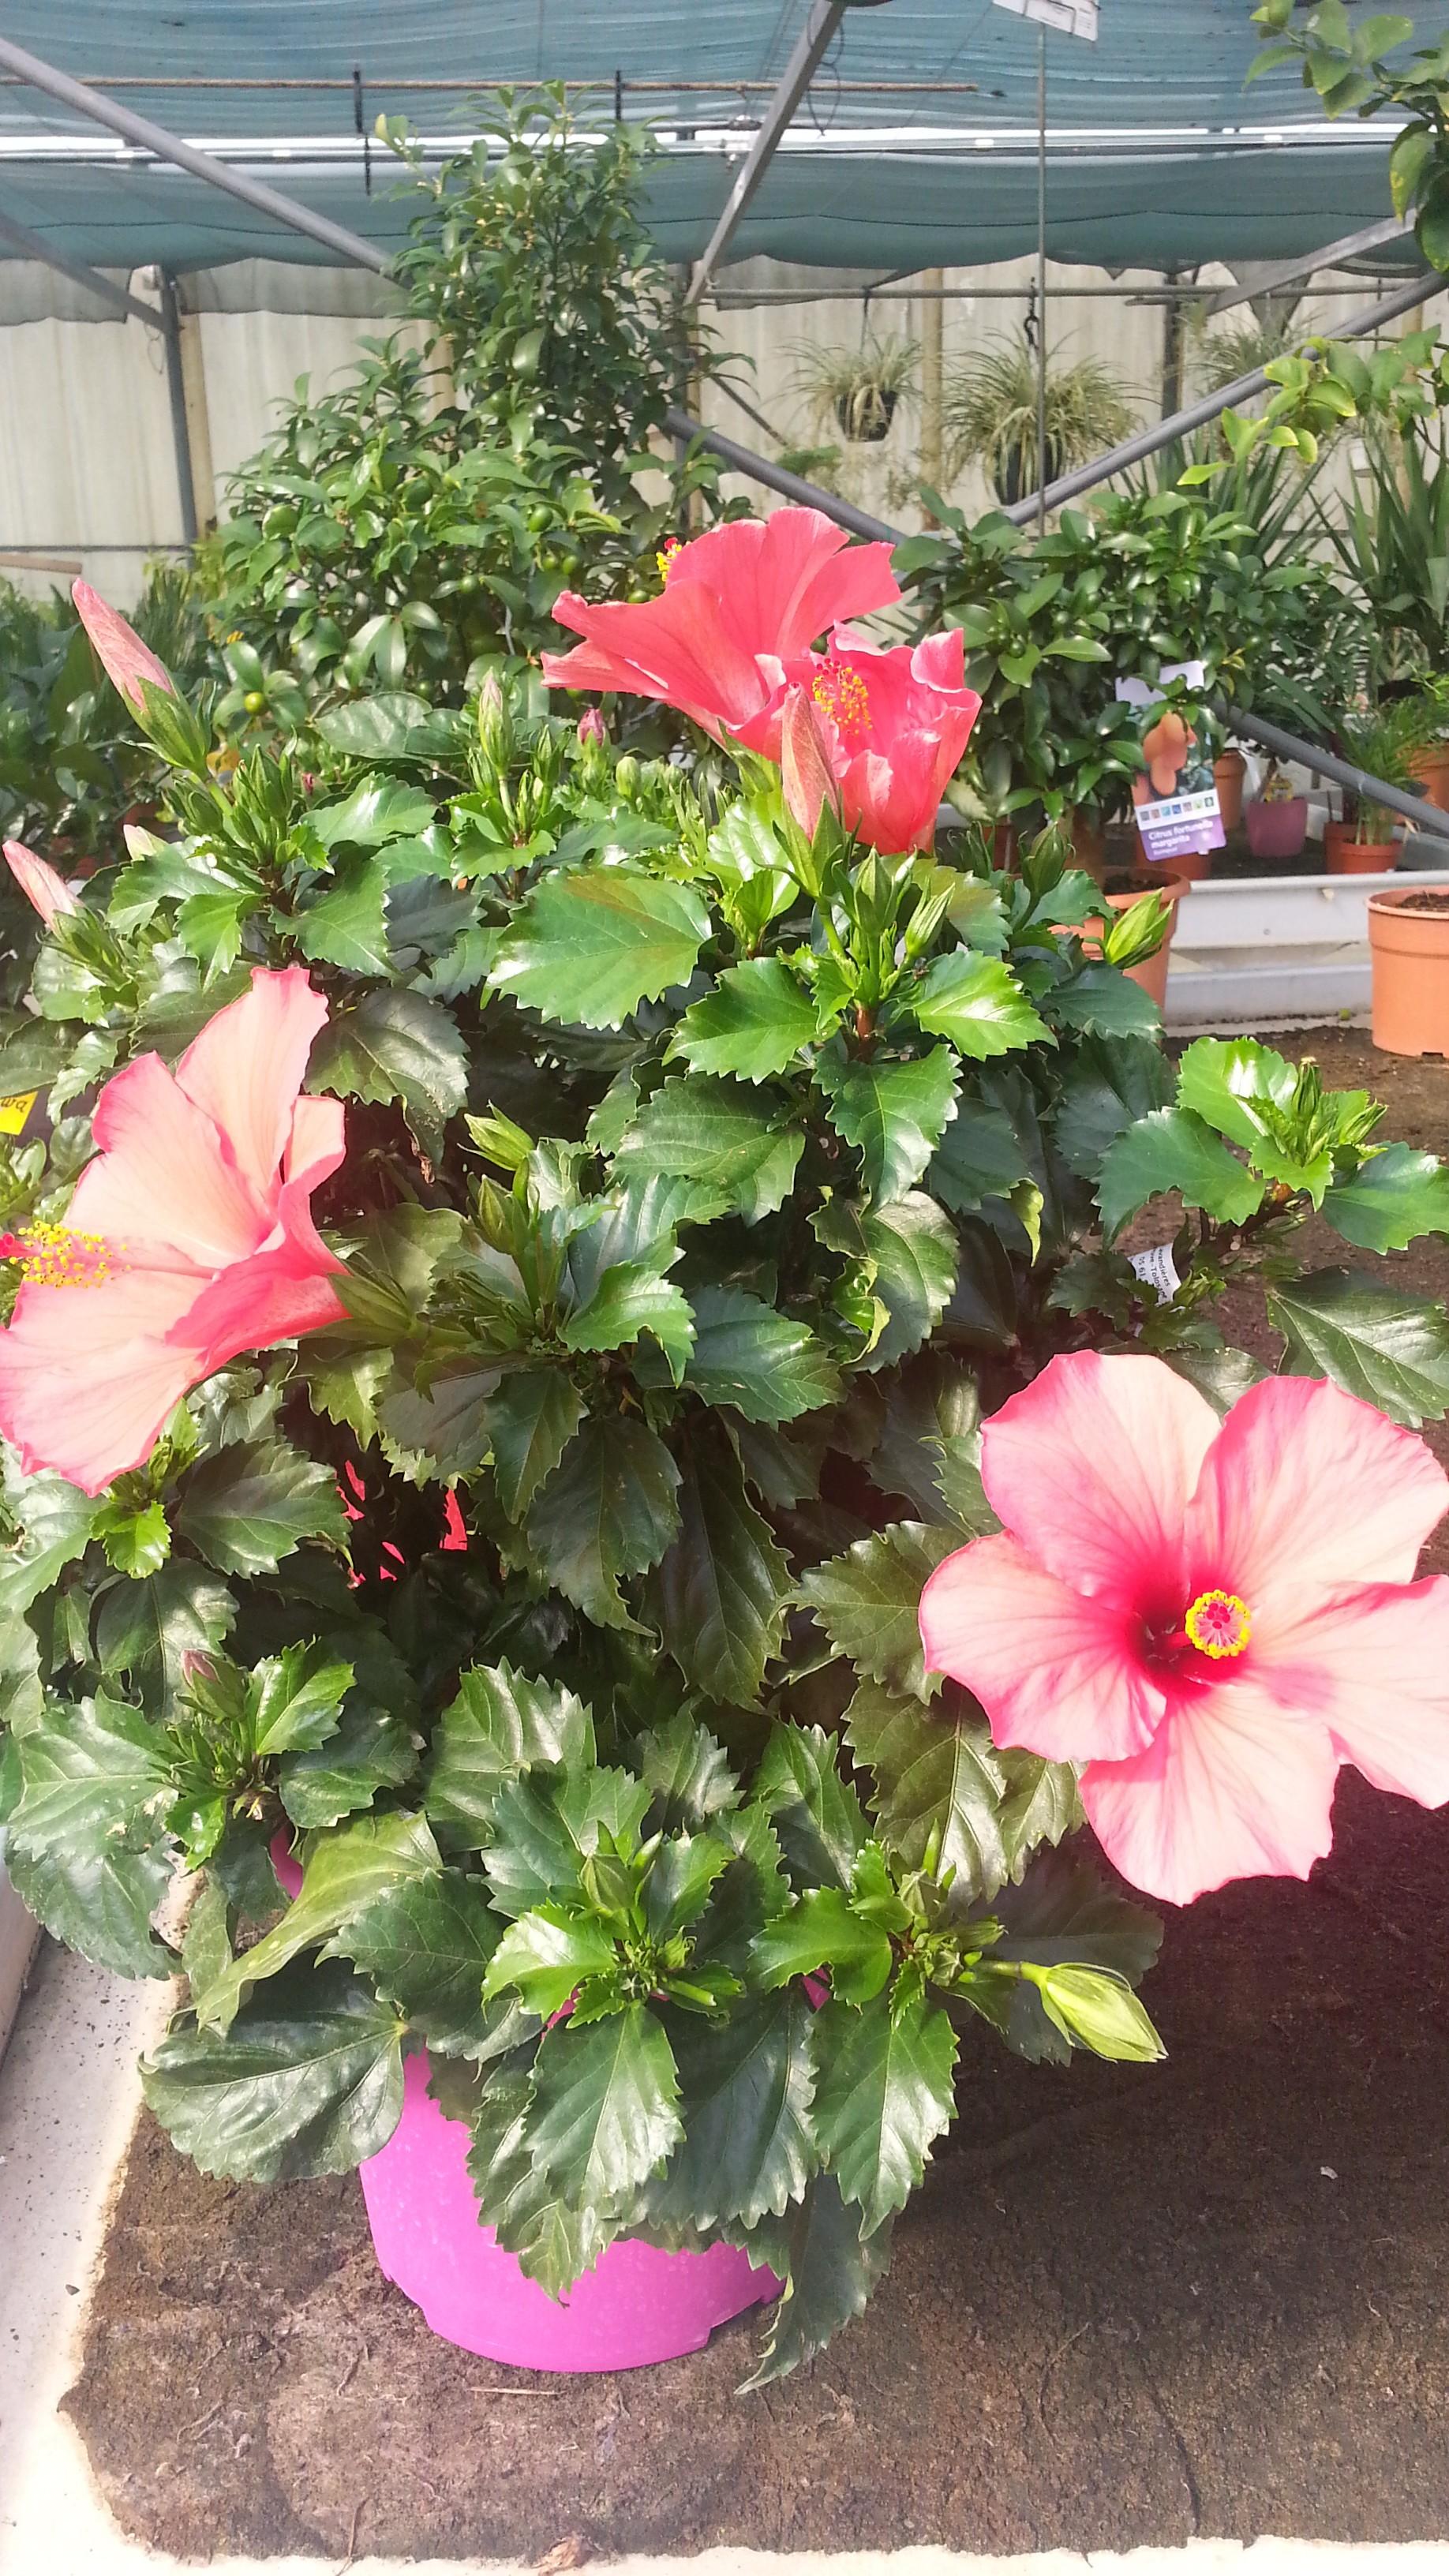 hibiscus de jardin persistant finest mauve en arbre with hibiscus de jardin persistant free. Black Bedroom Furniture Sets. Home Design Ideas